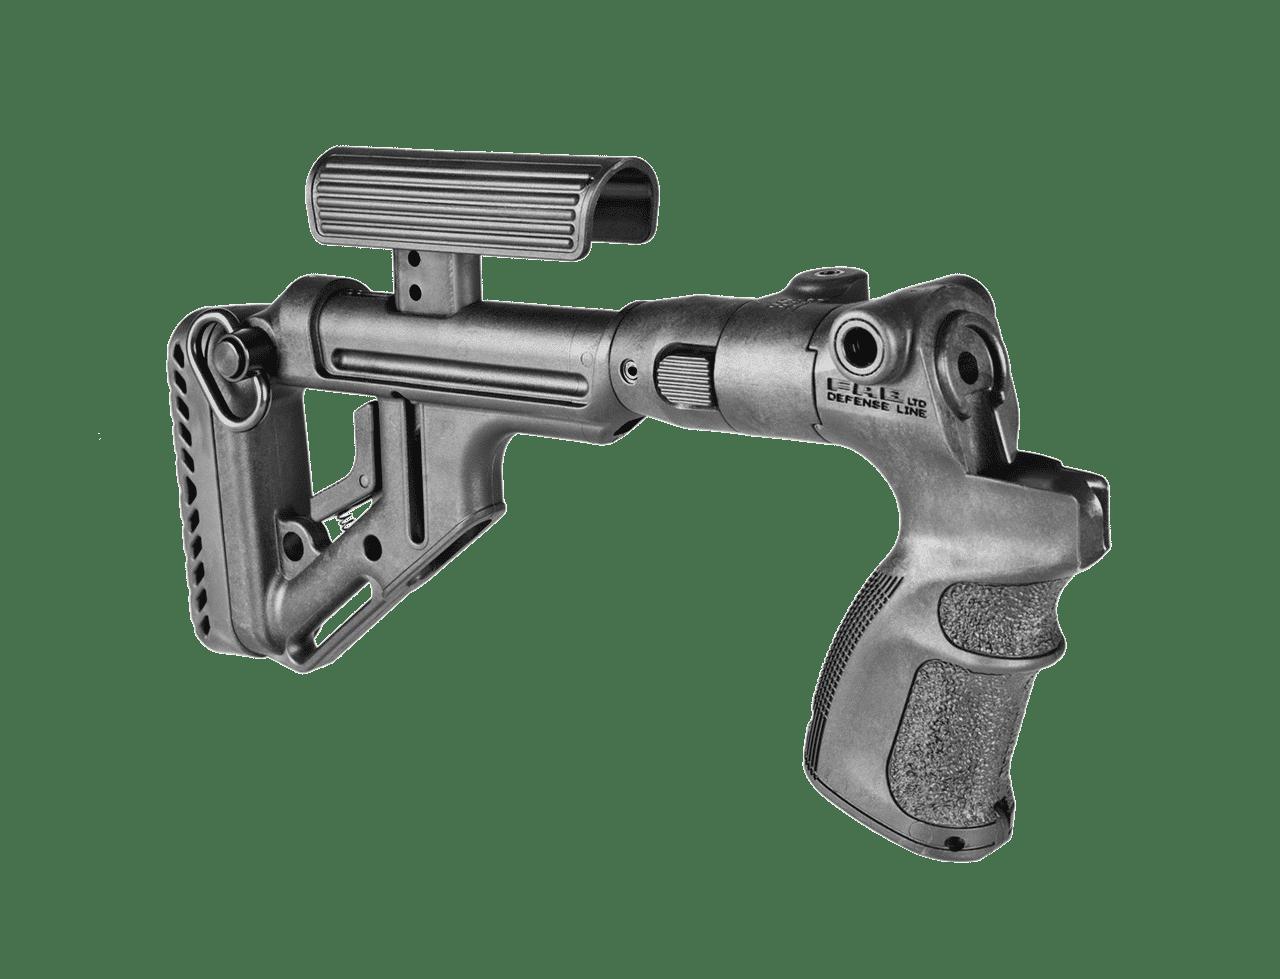 UAS-500 Fab Defense Mossberg 500 Pistol Grip and Folding Buttstock - ZFI-Inc